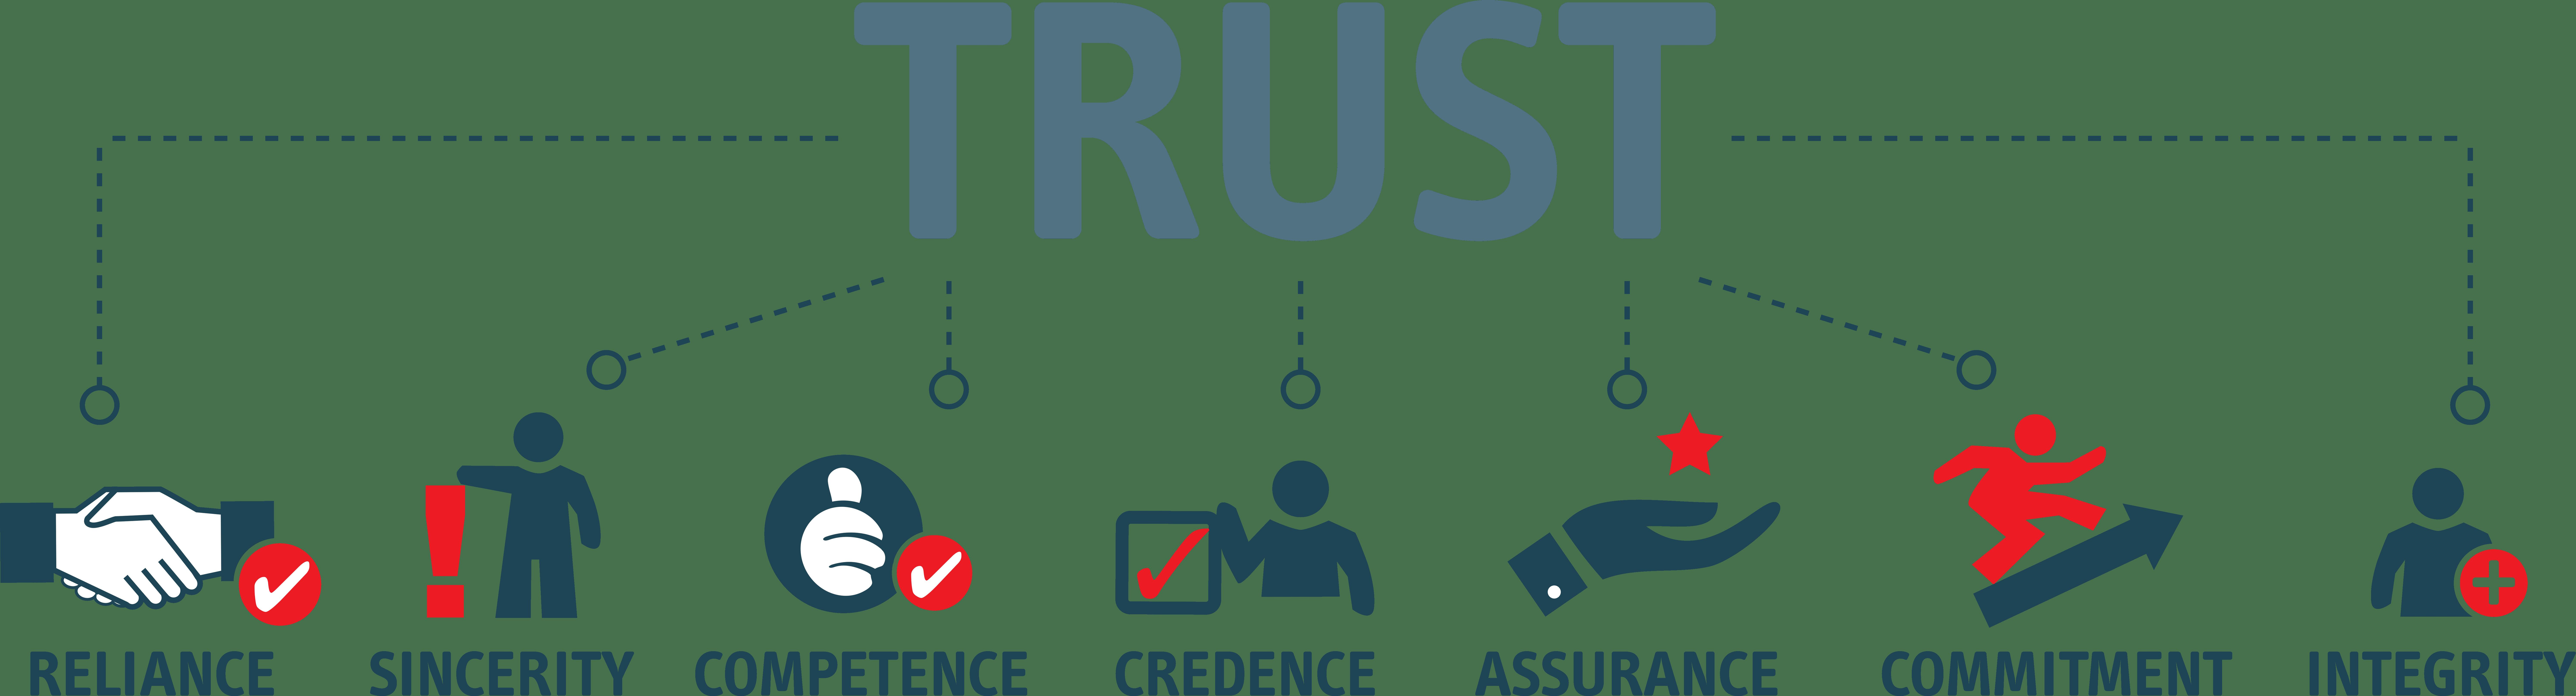 Commitment Trust of Diversified Concrete